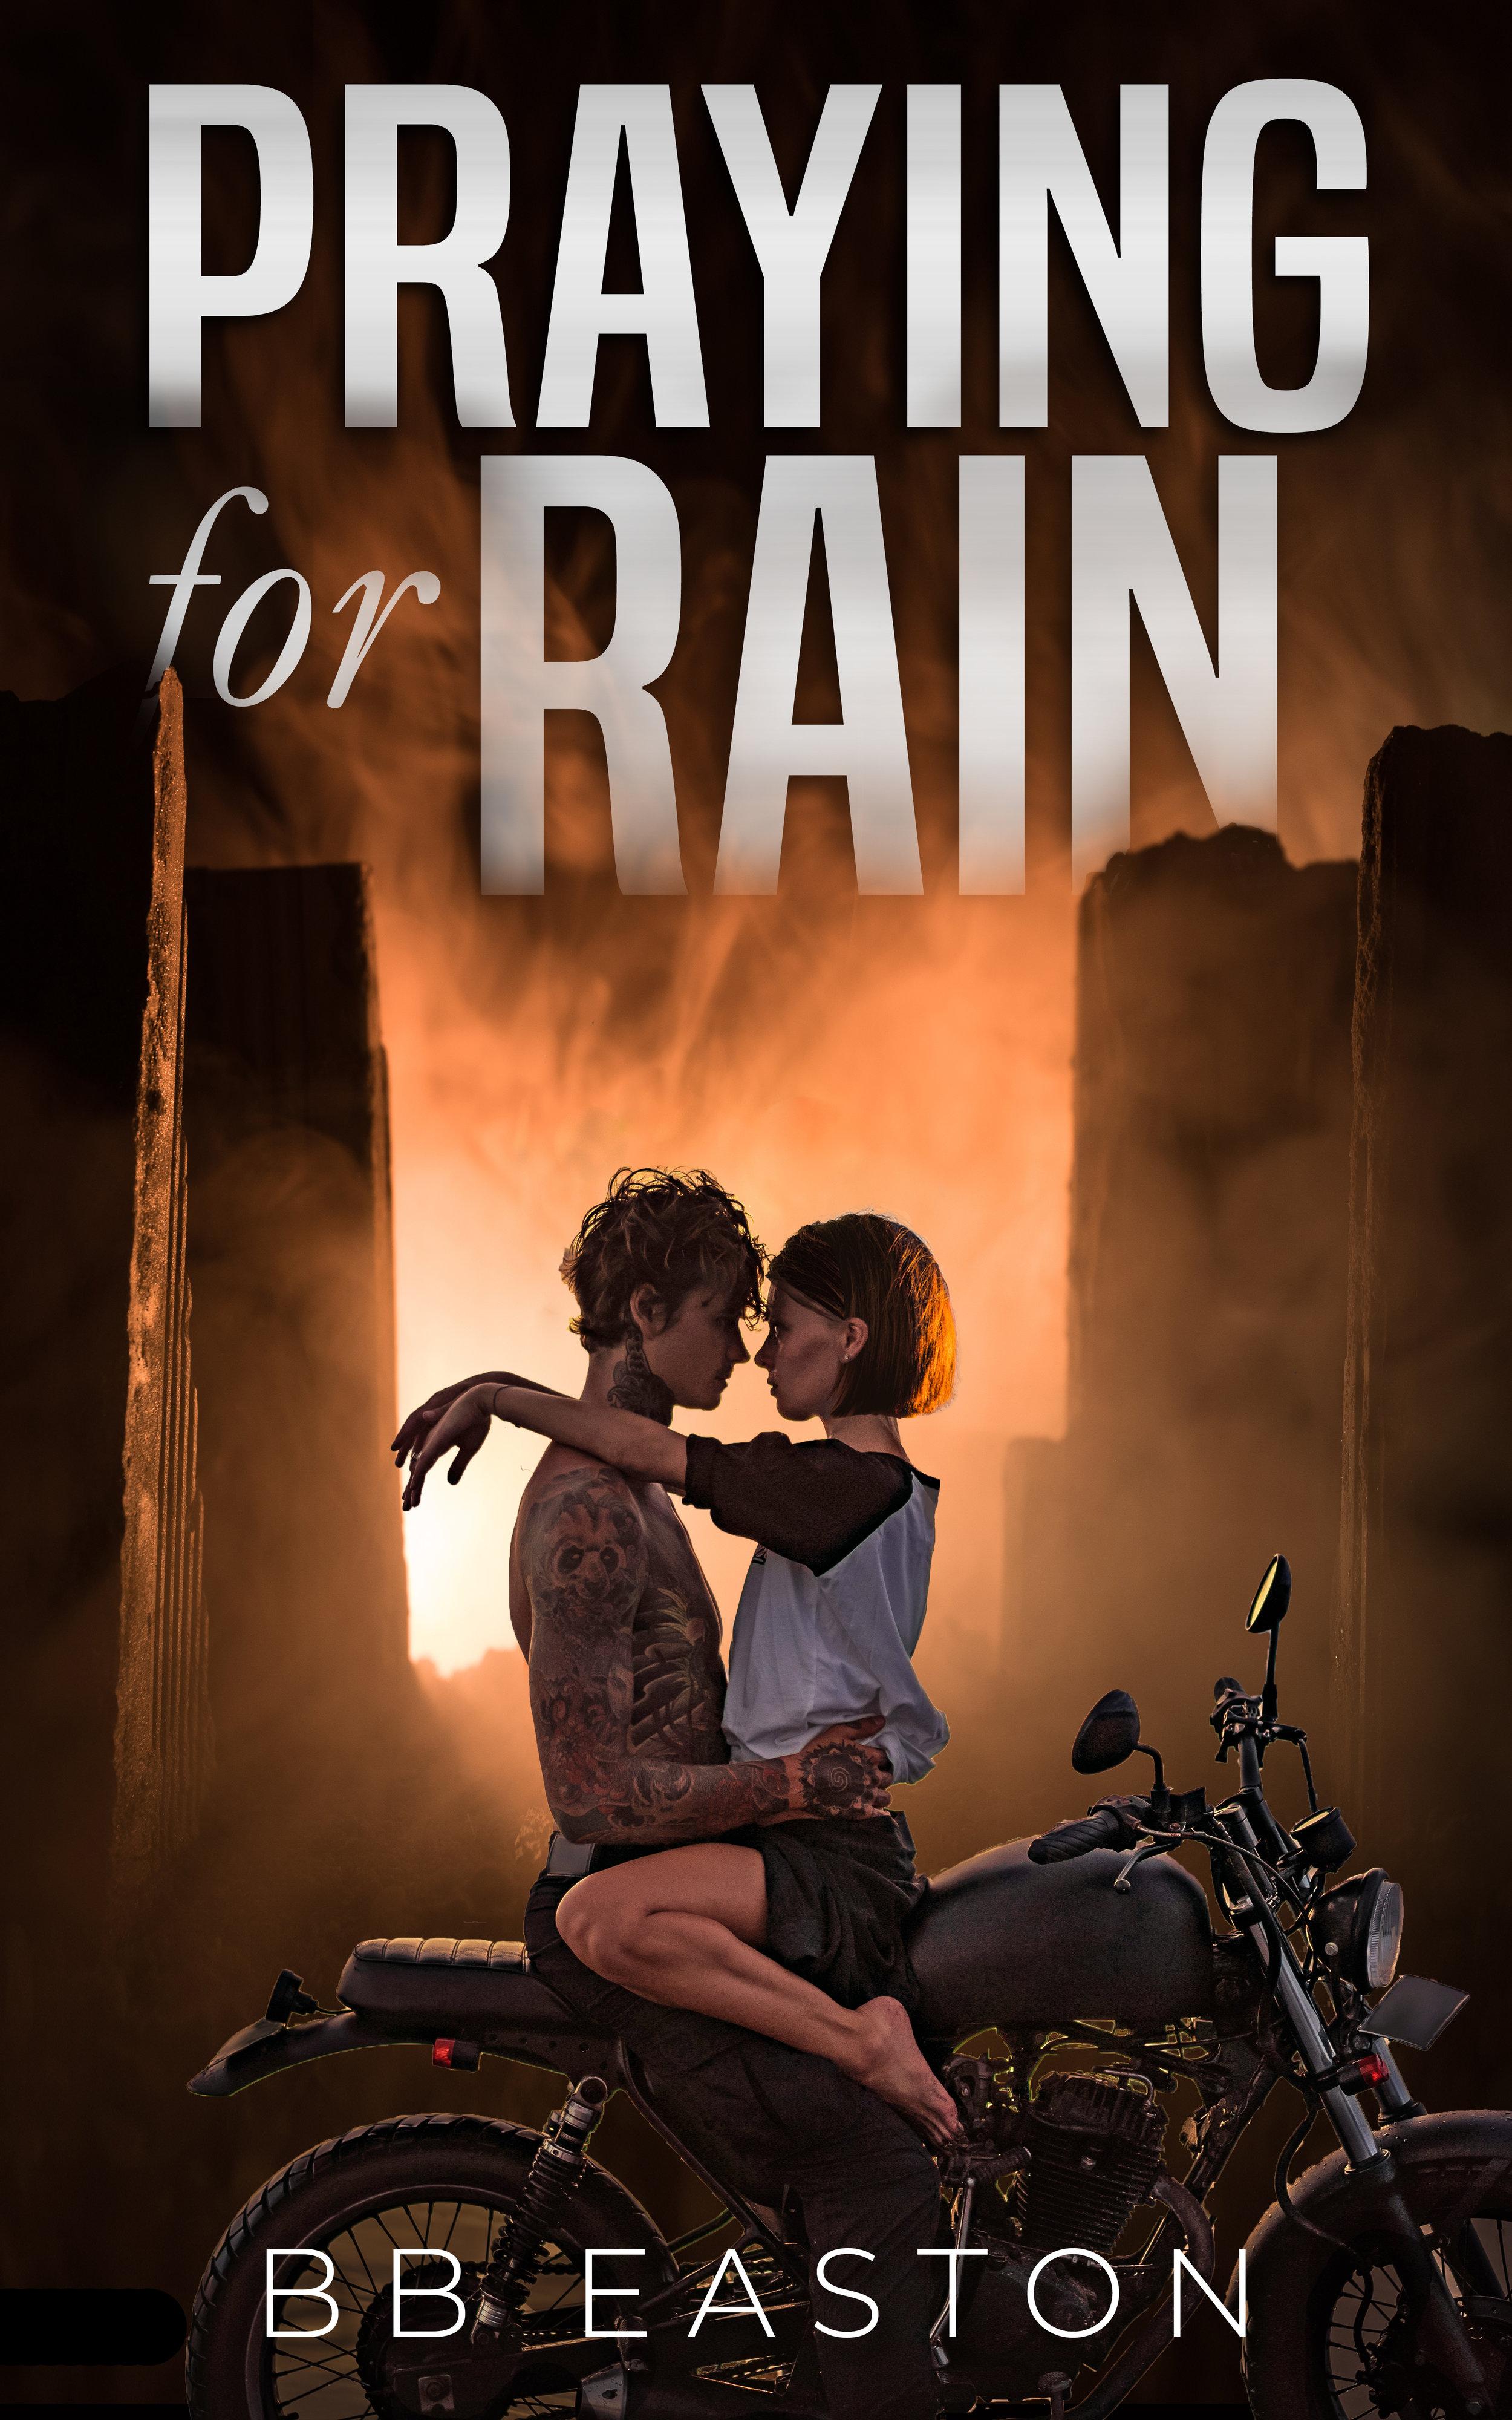 Praying for Rain ebook cover.jpg